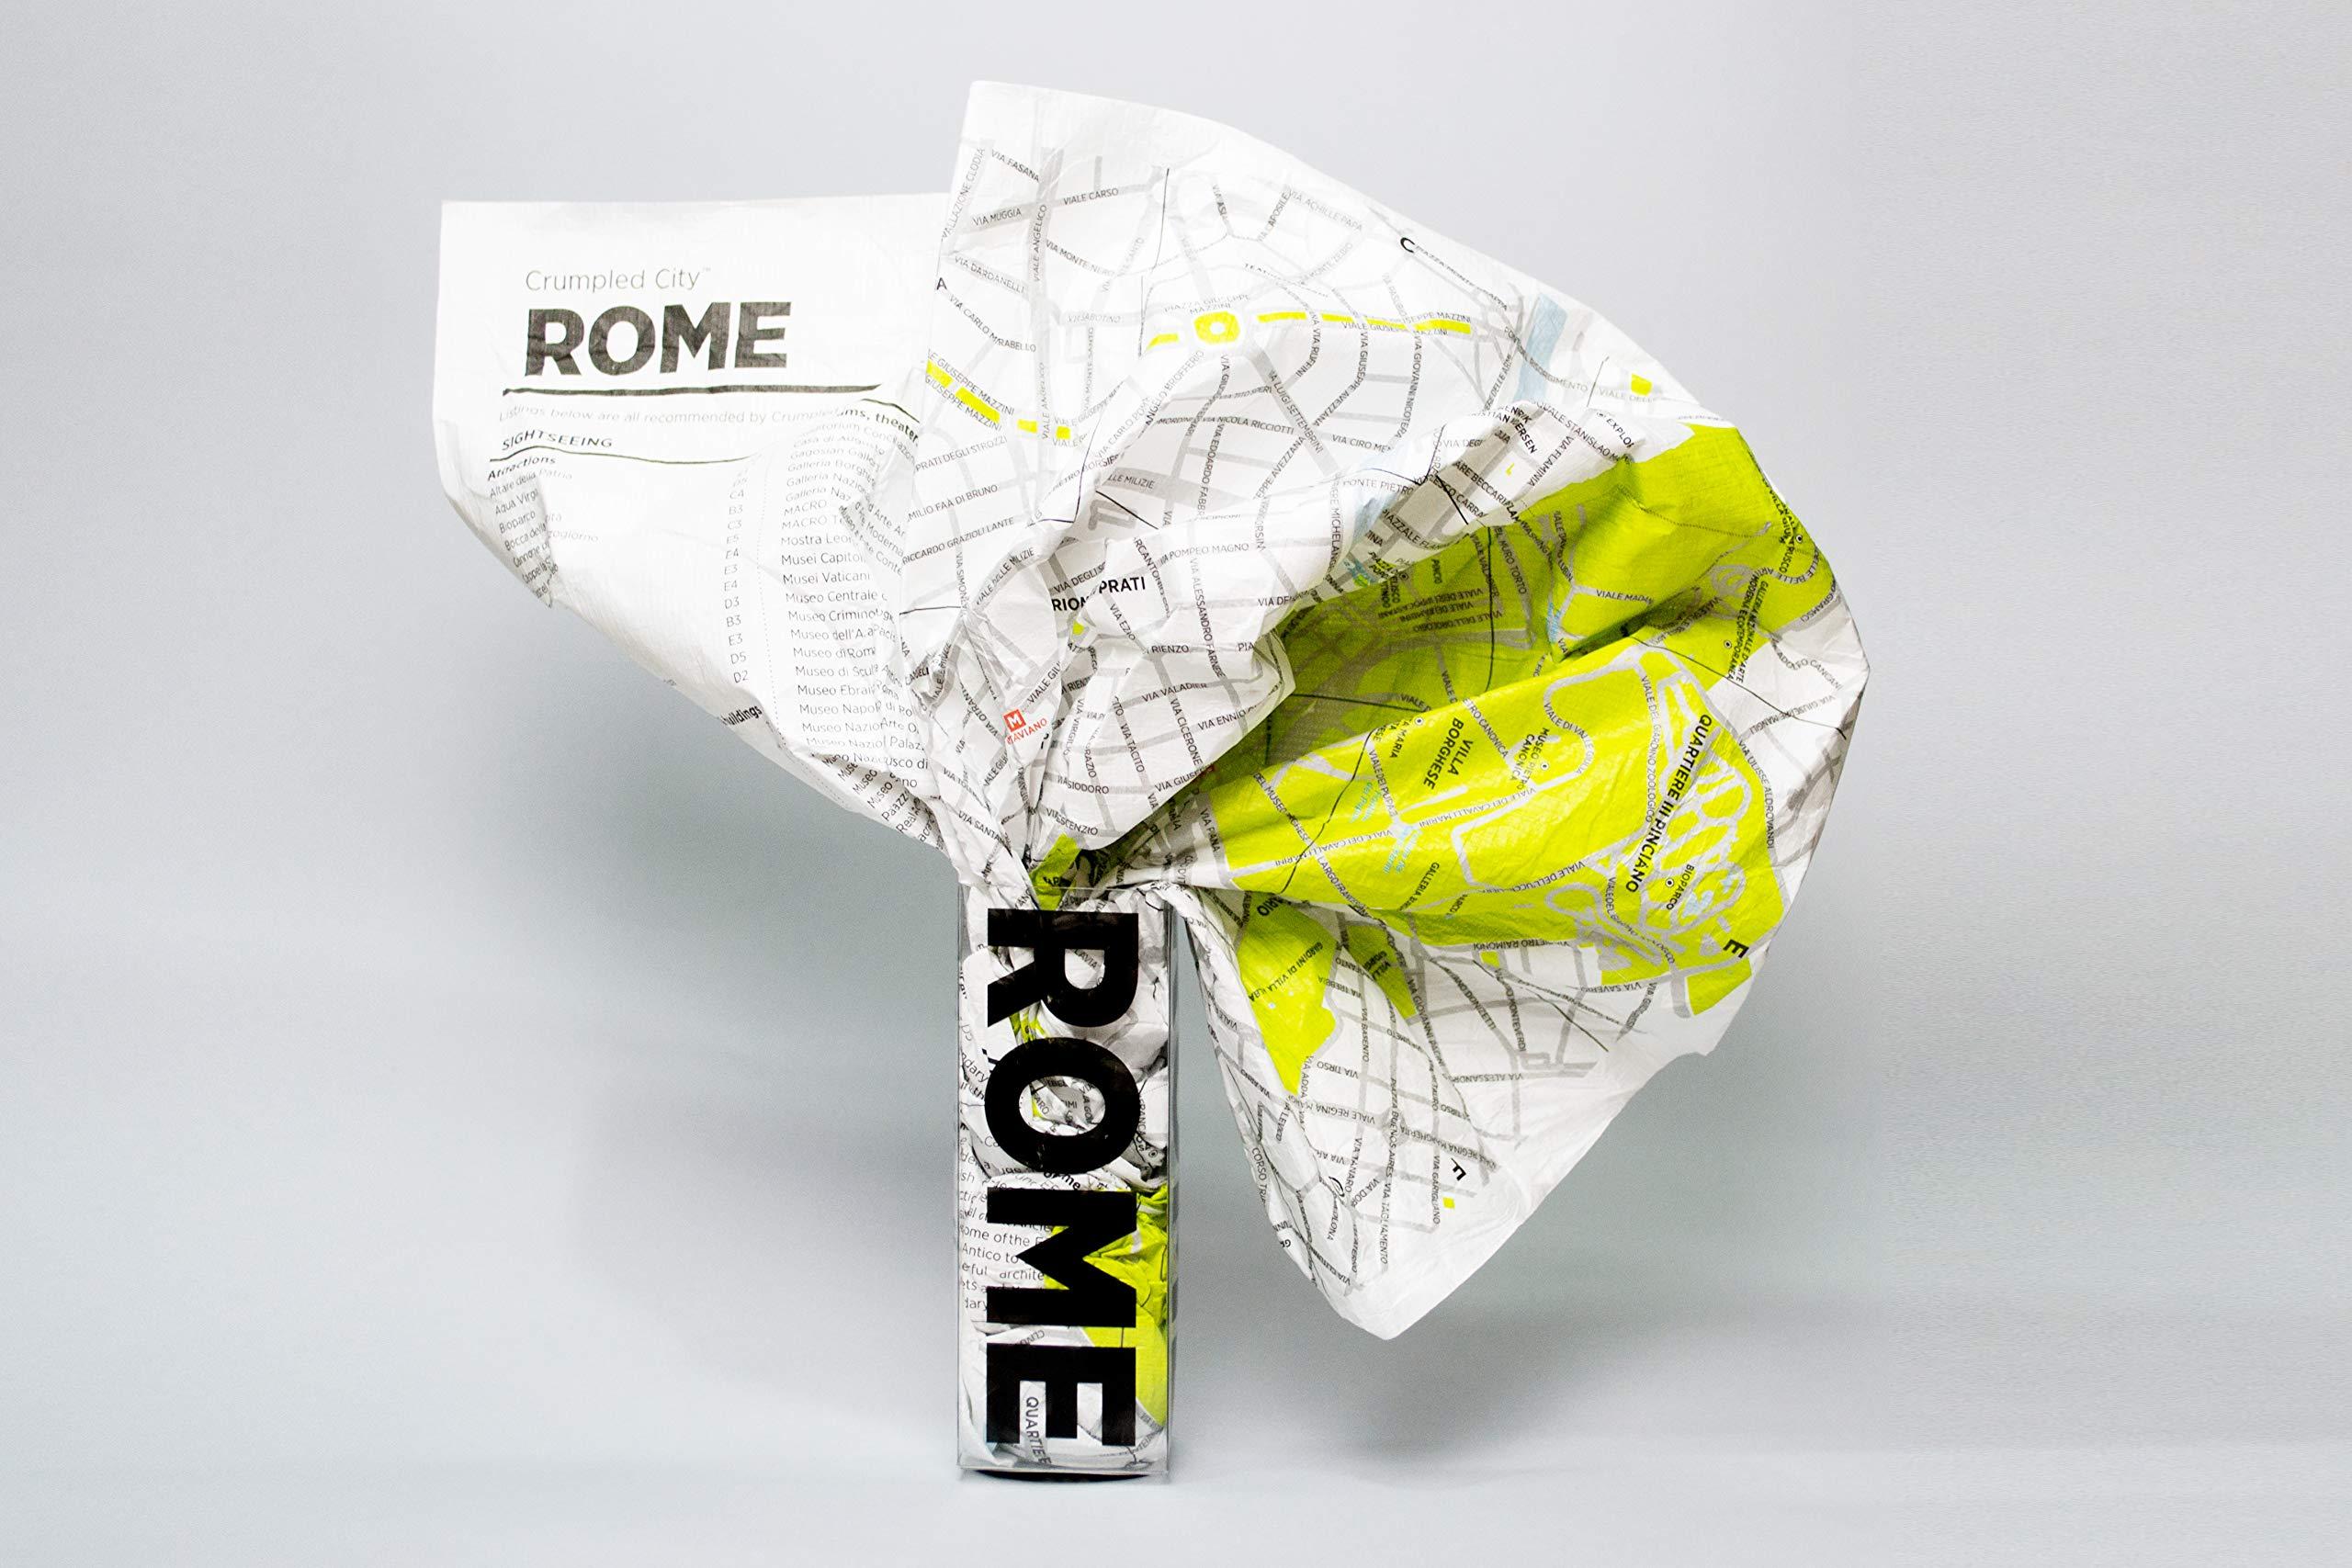 Crumpled City: Rome (Crumpled City Maps)